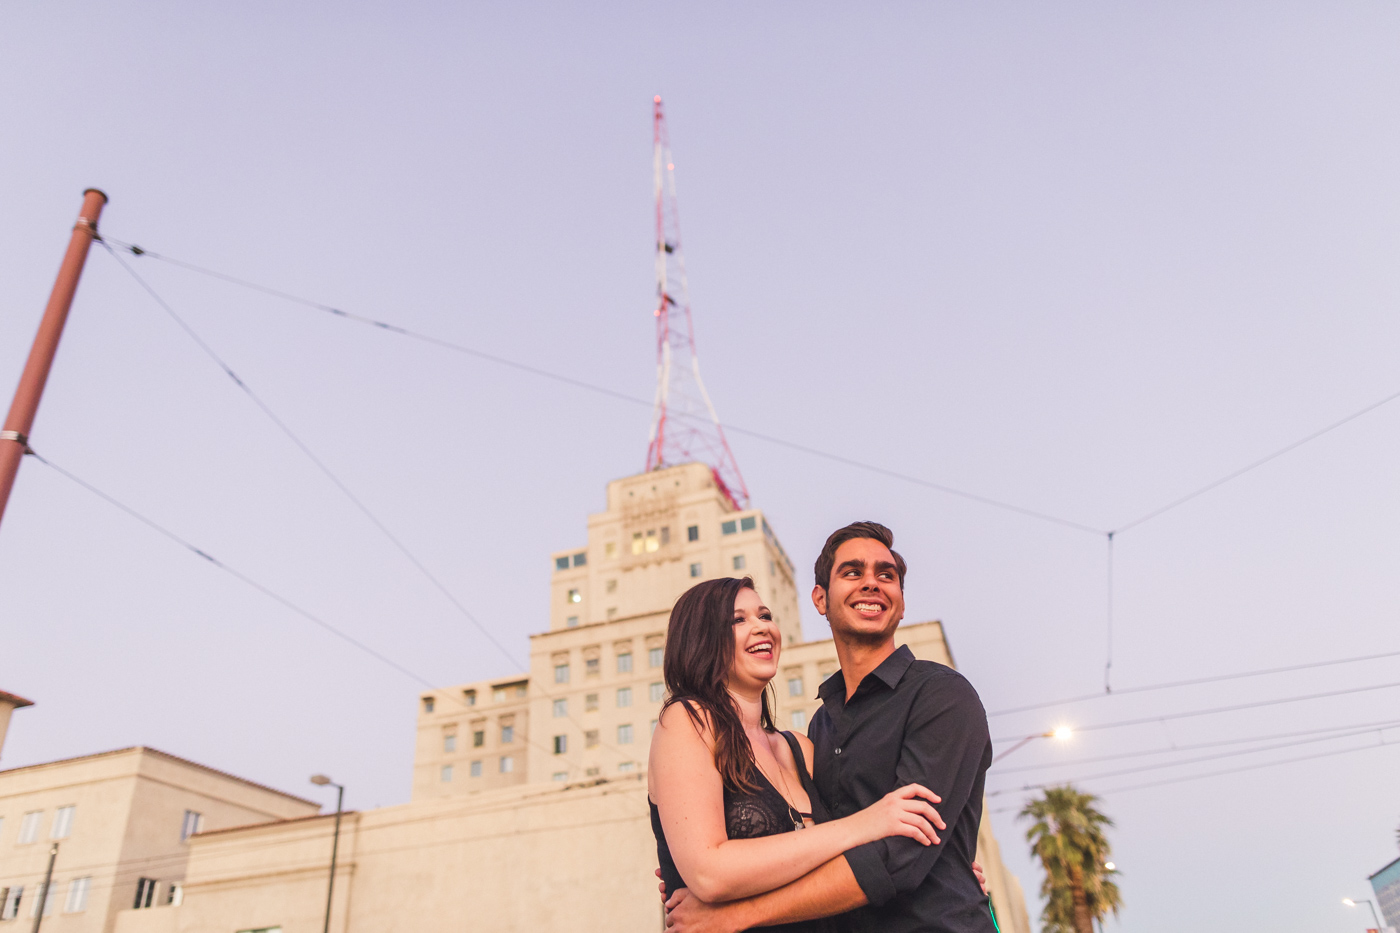 downtown-phoenix-westward-ho-engagement-photo